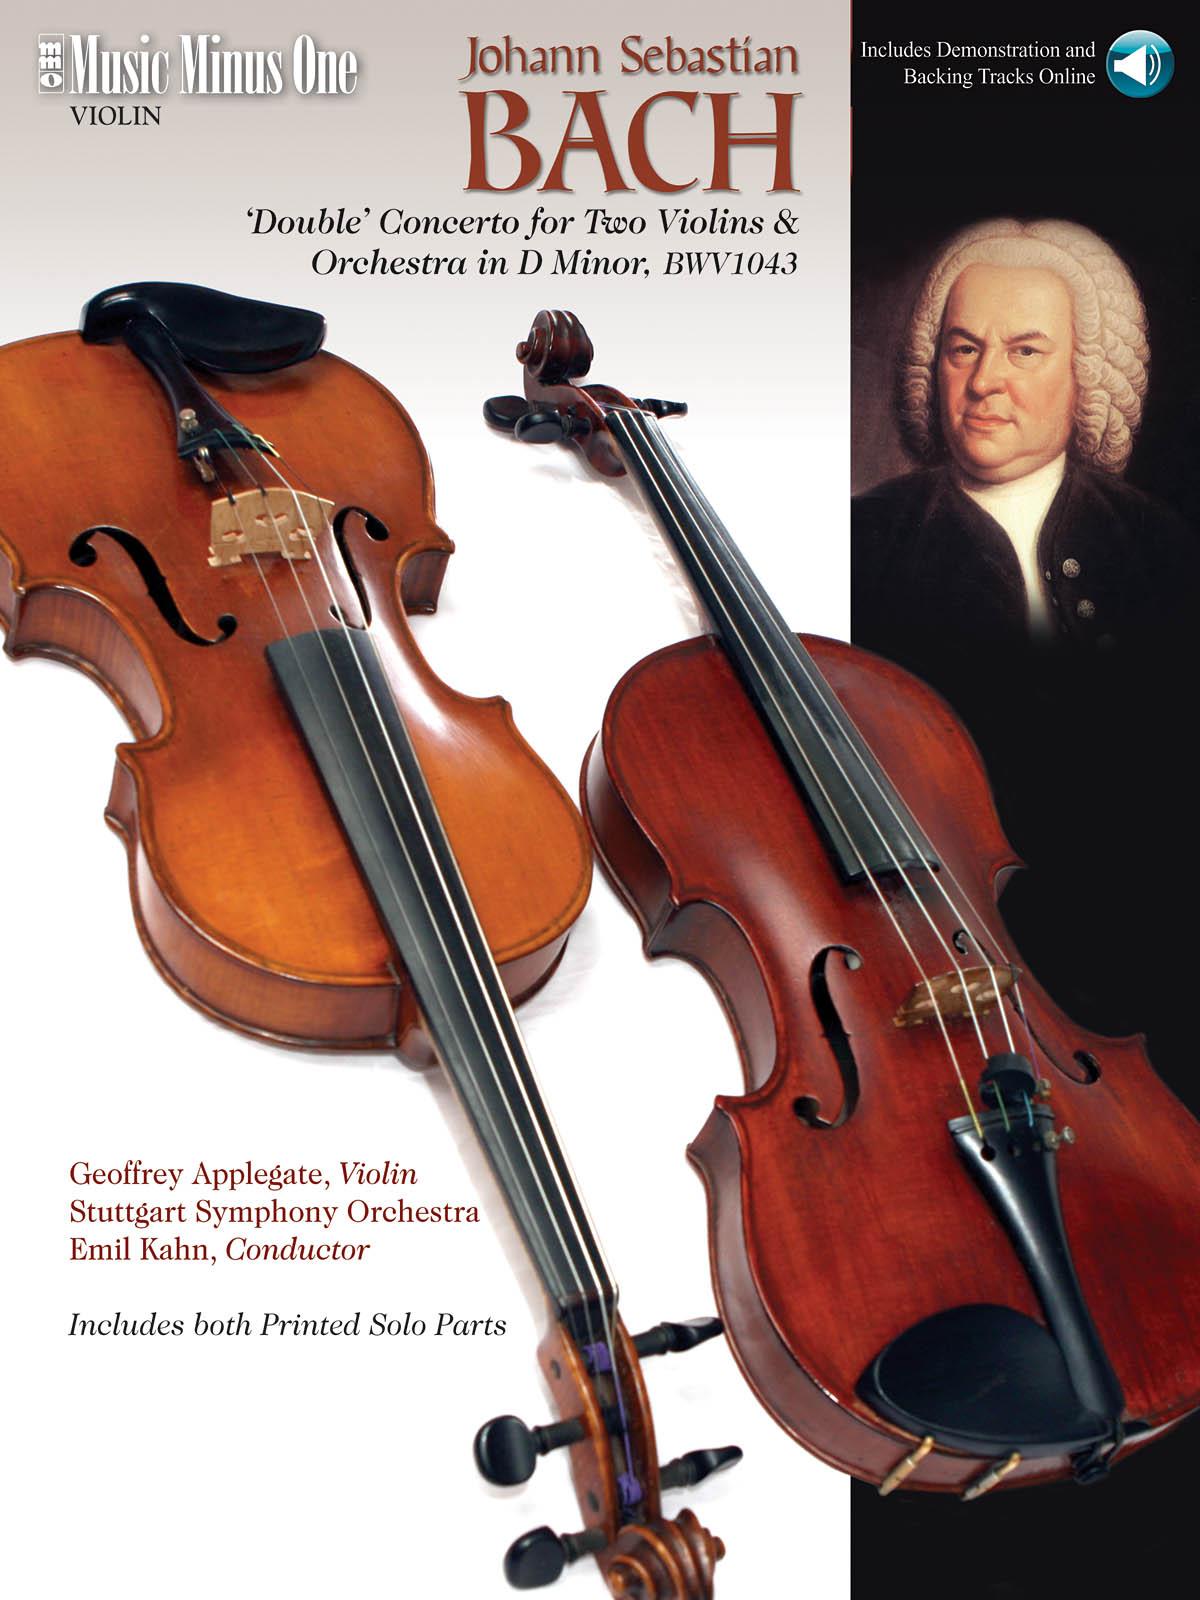 Johann Sebastian Bach: J.S. Bach - Double Concerto in D Minor  BWV1043: Violin